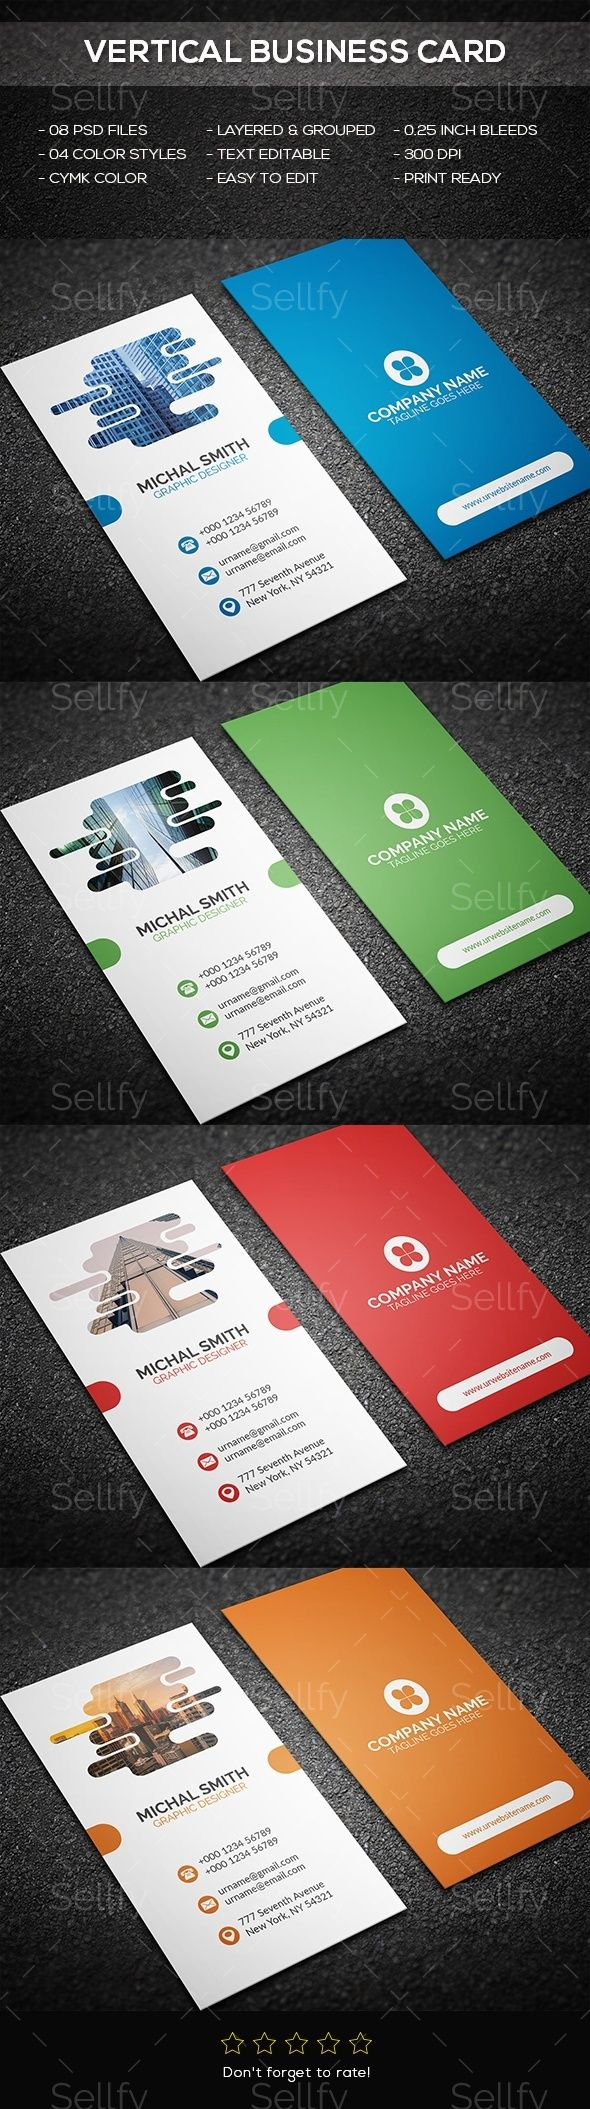 Vertical Business Card   Vertical business cards, Print templates ...